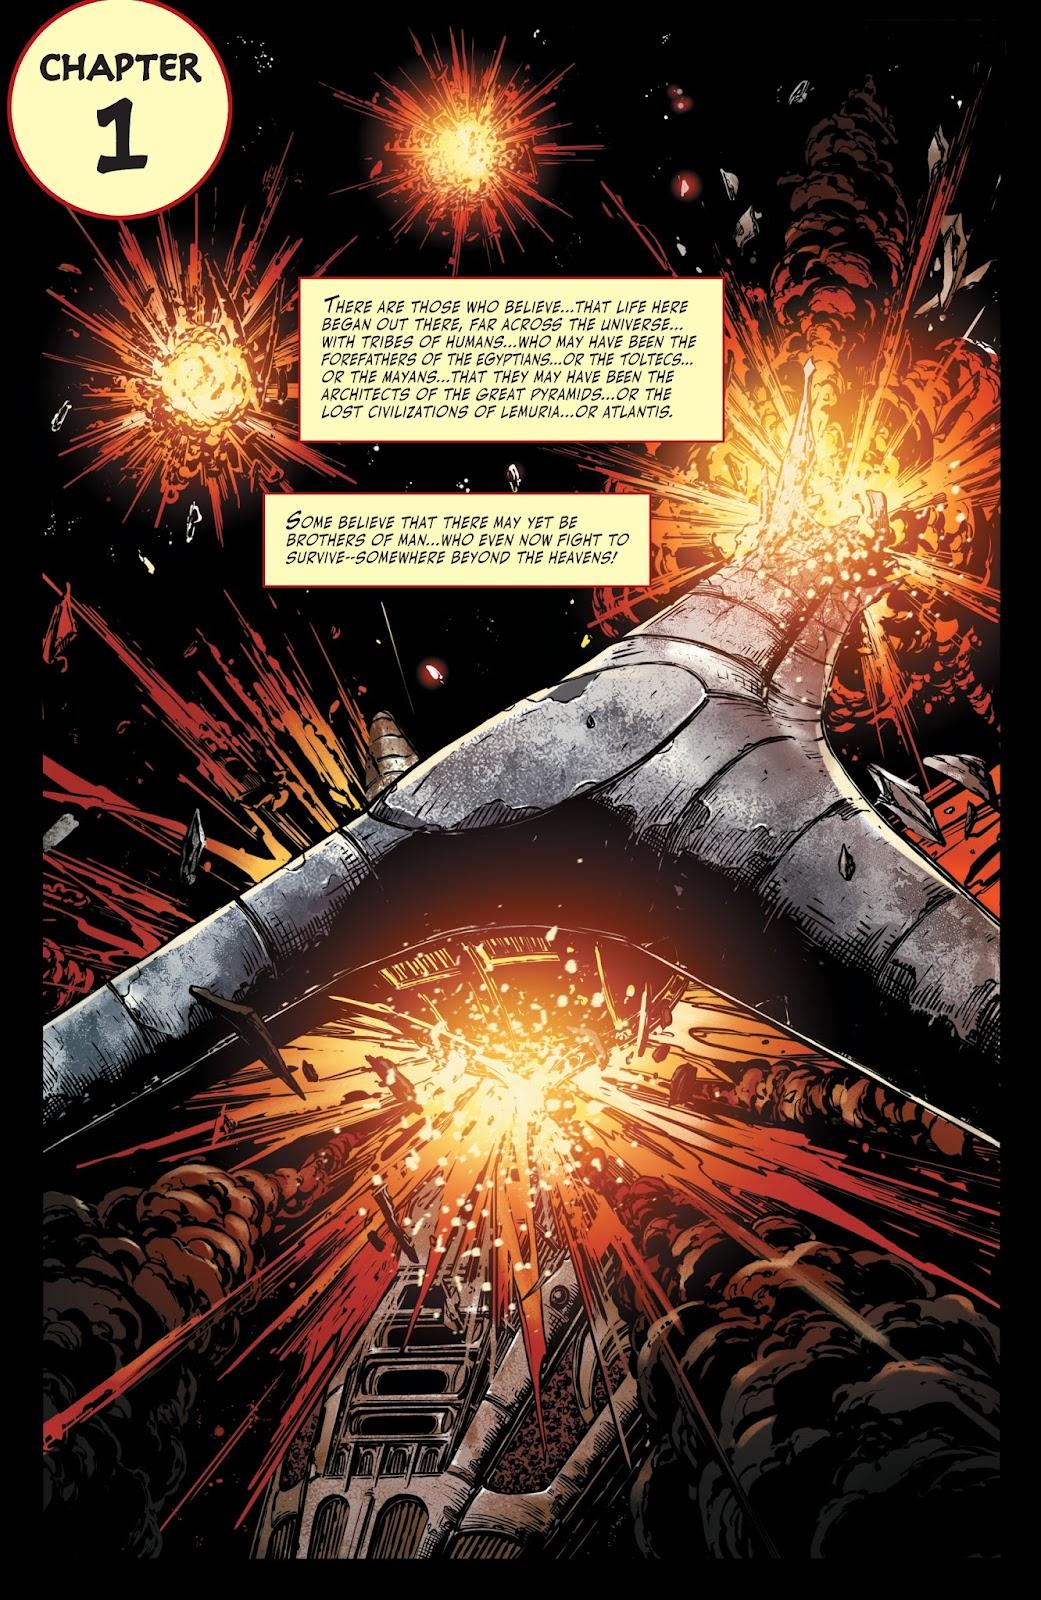 Battlestar Galactica BSG vs. BSG issue 1 - Page 4